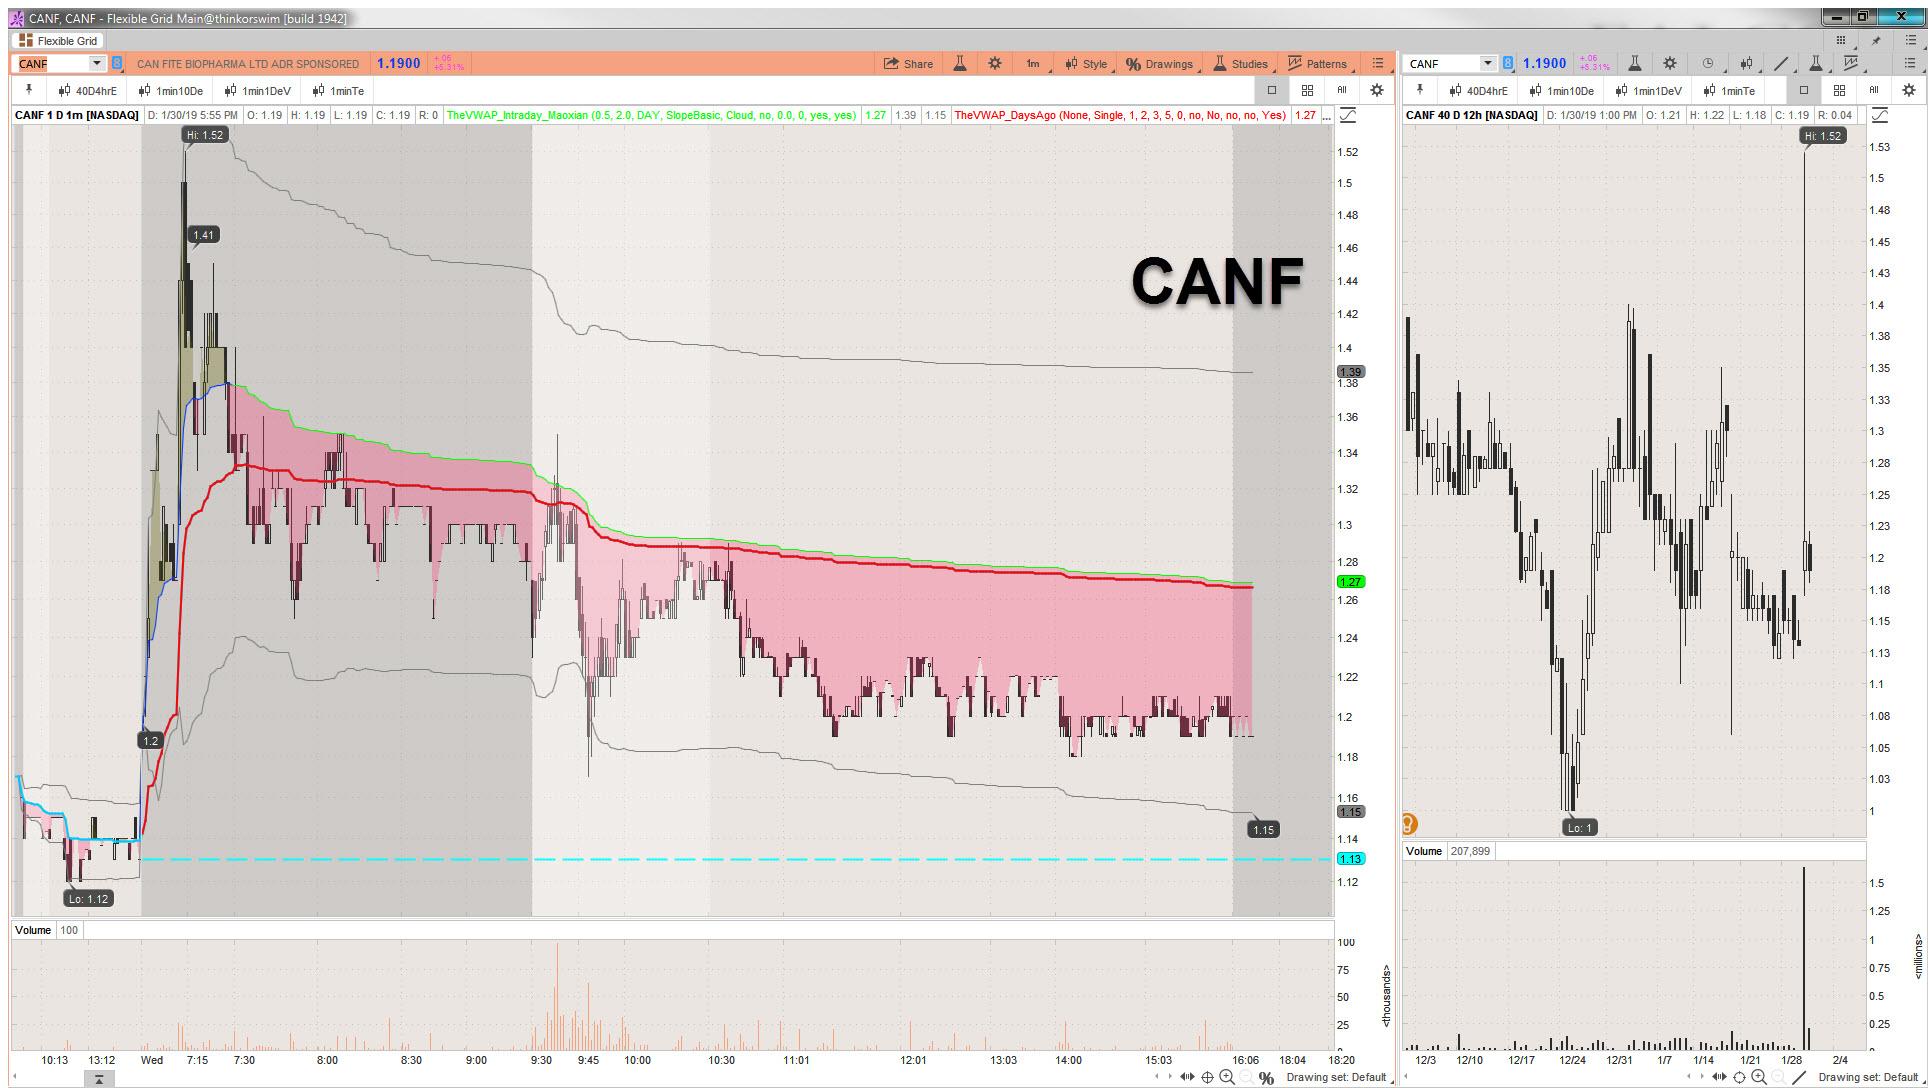 2019-01-30_19-37-44 CANF.jpg